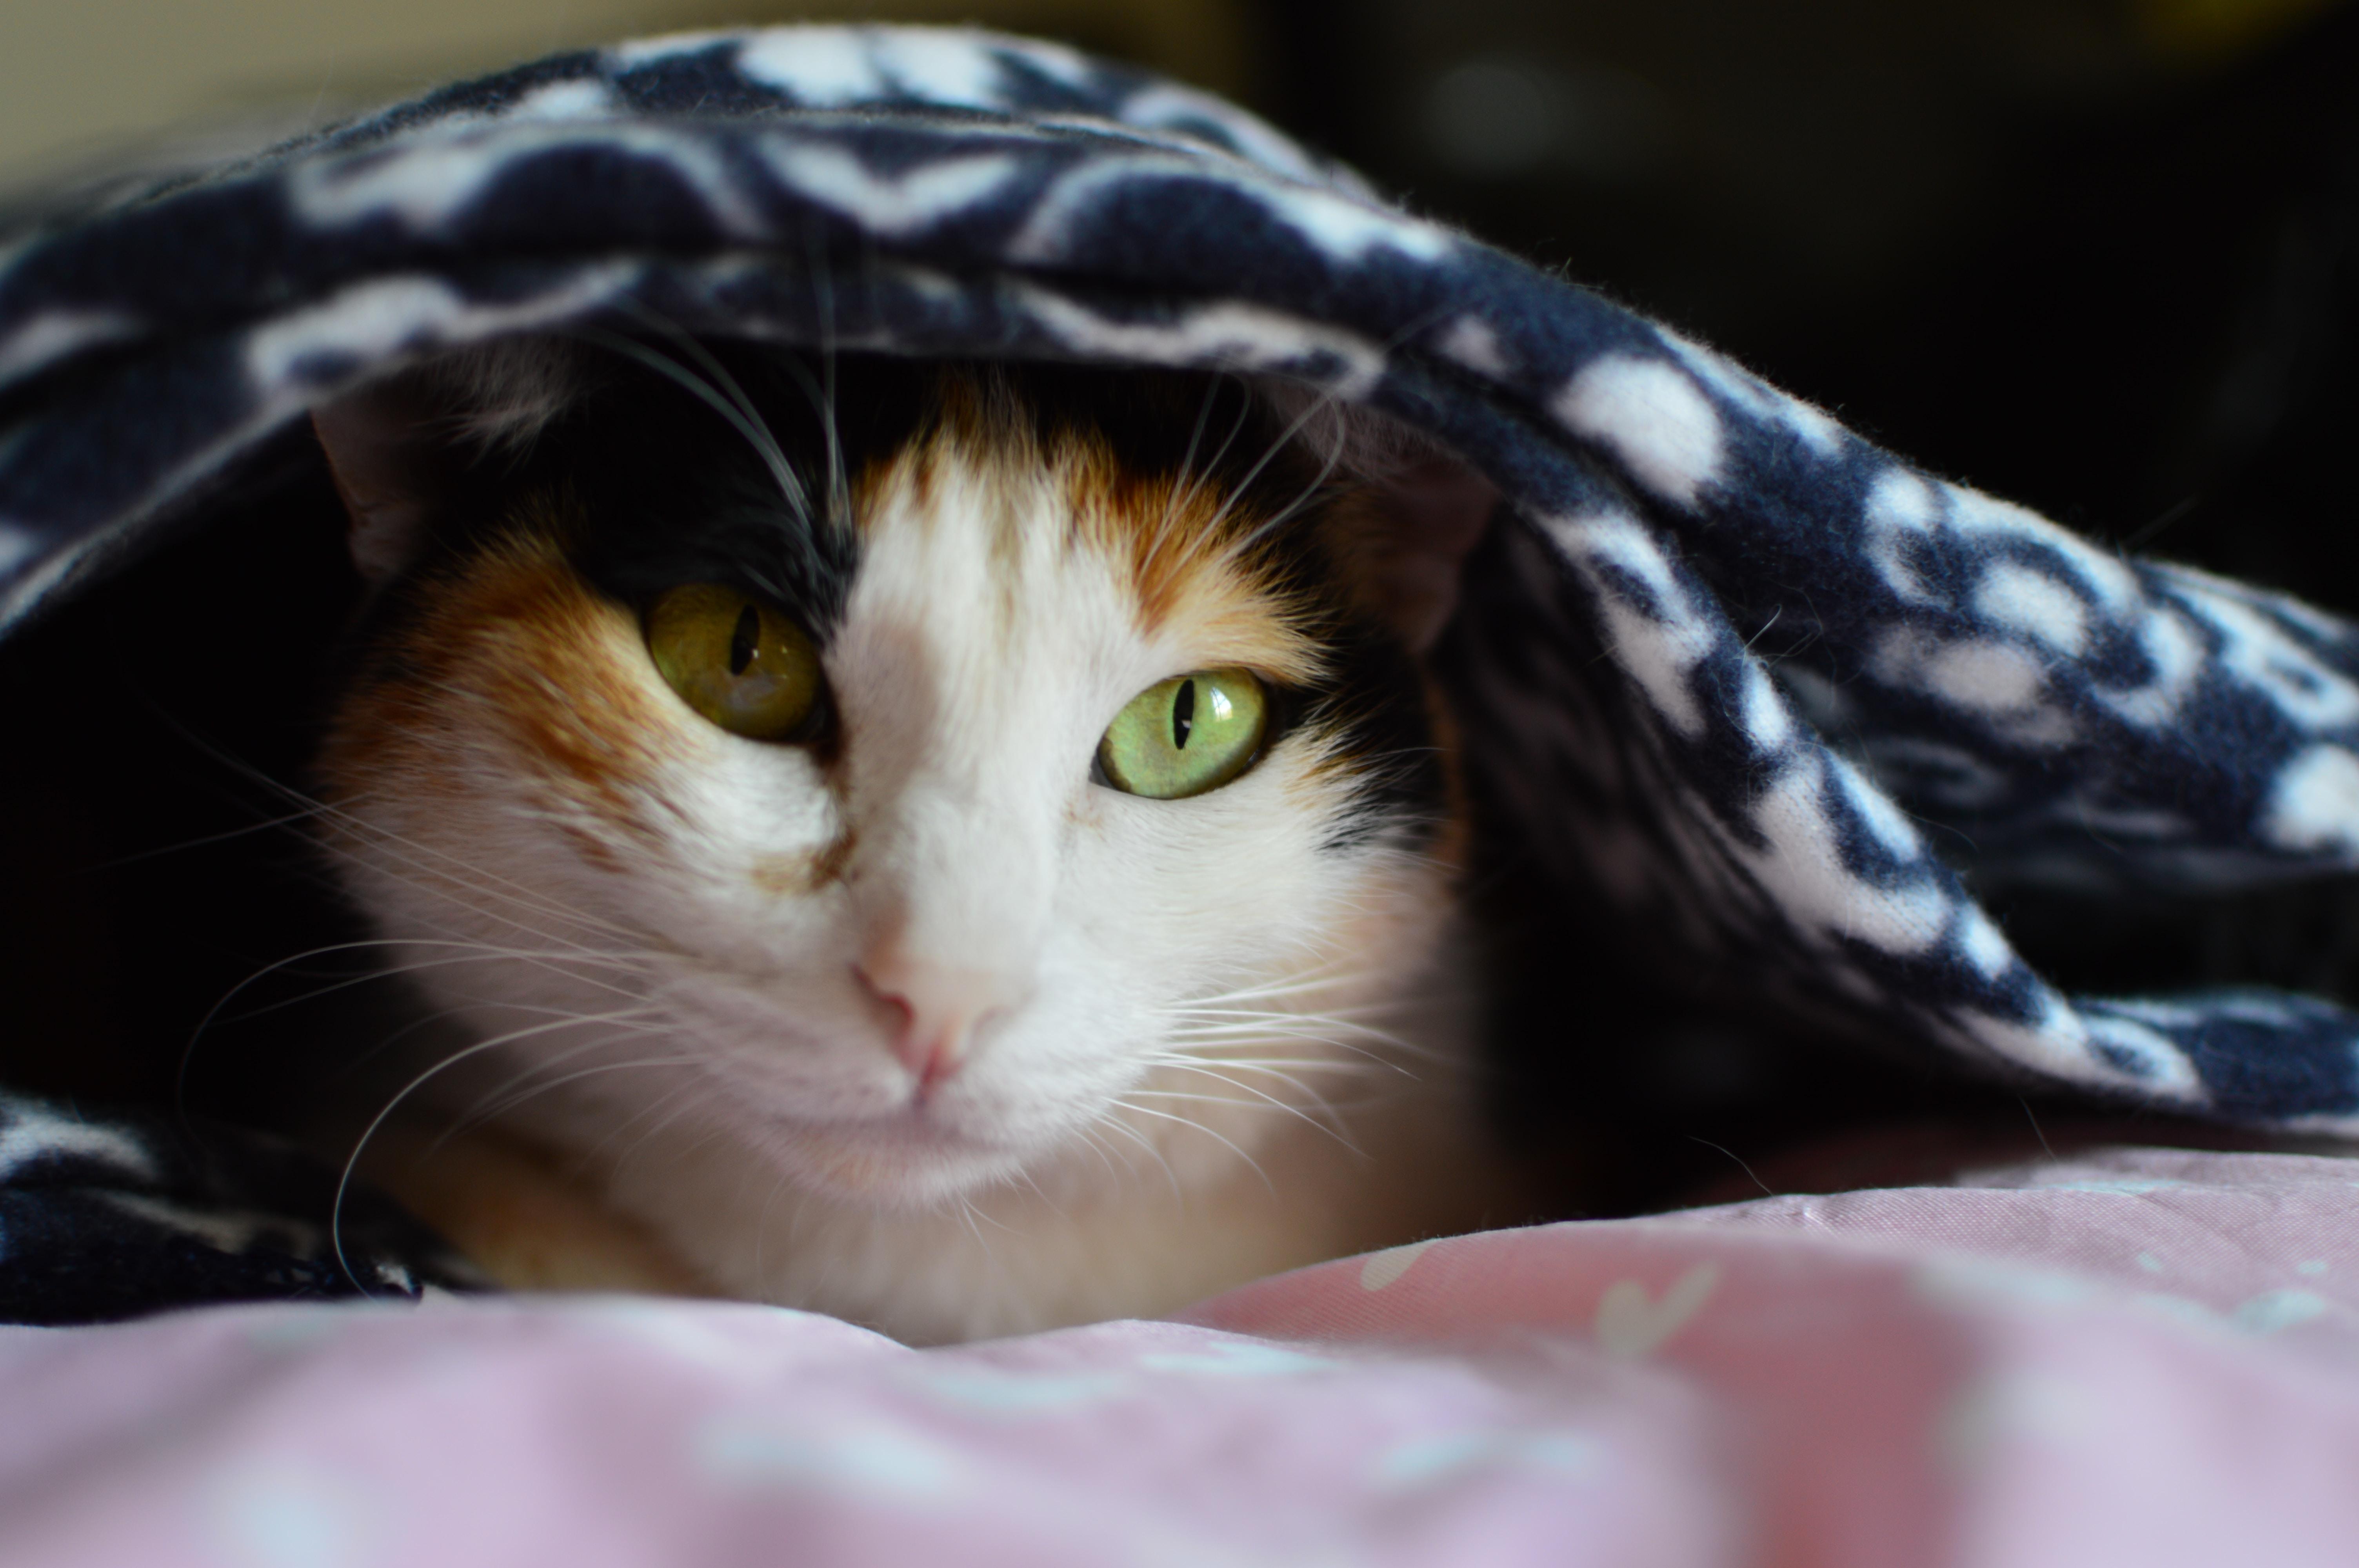 white calico cat hiding on blanket during daytime